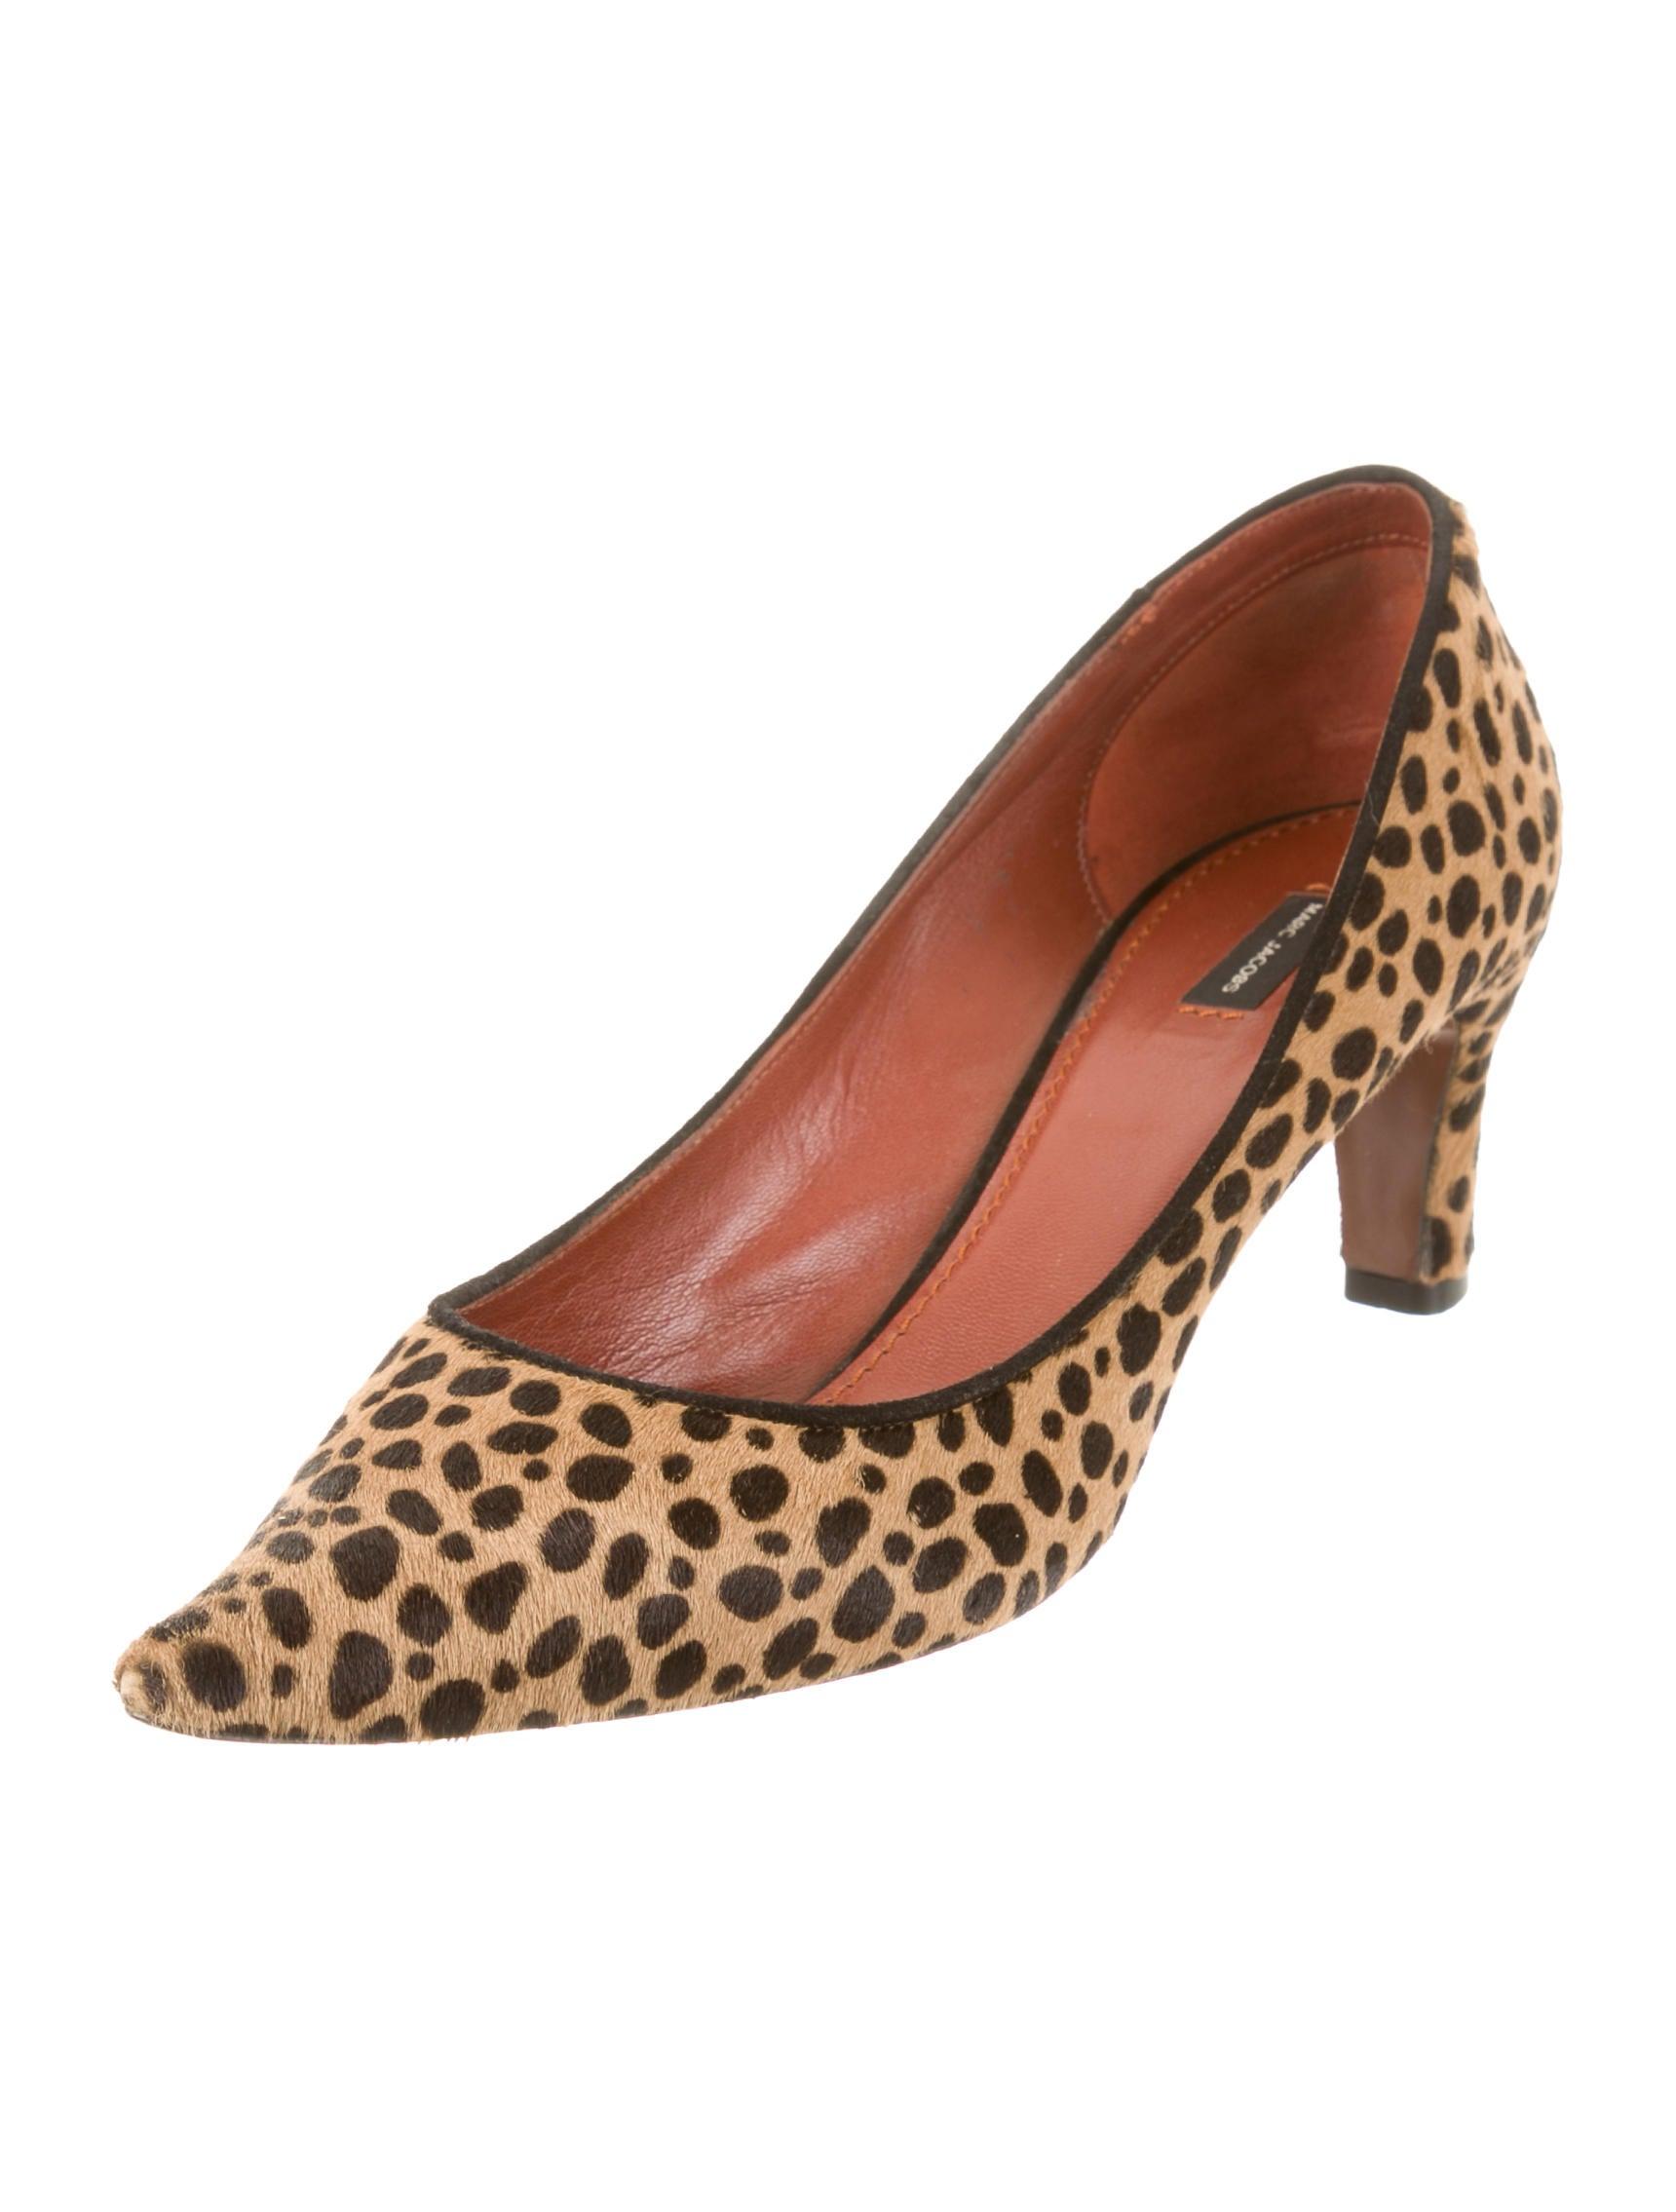 Marc Jacobs Cheetah Print Pumps Shoes Mar30108 The